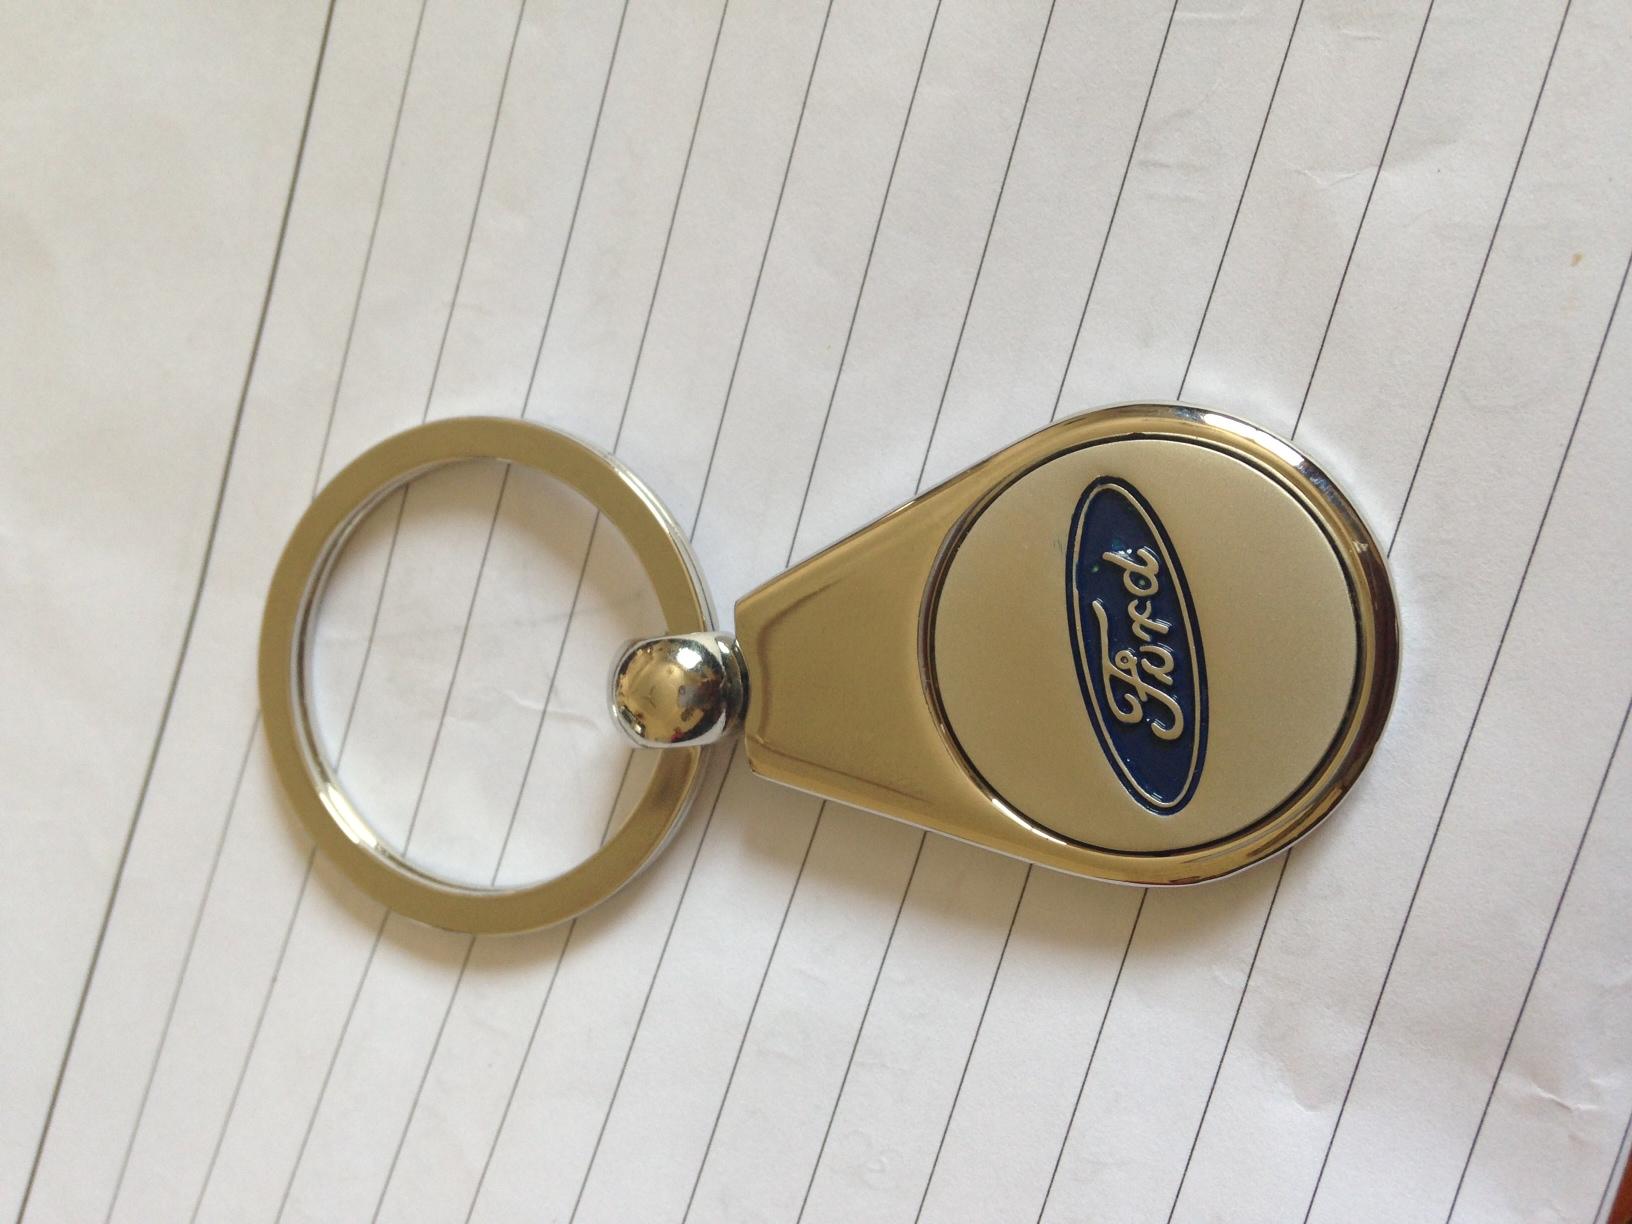 Ford Metal Keychain